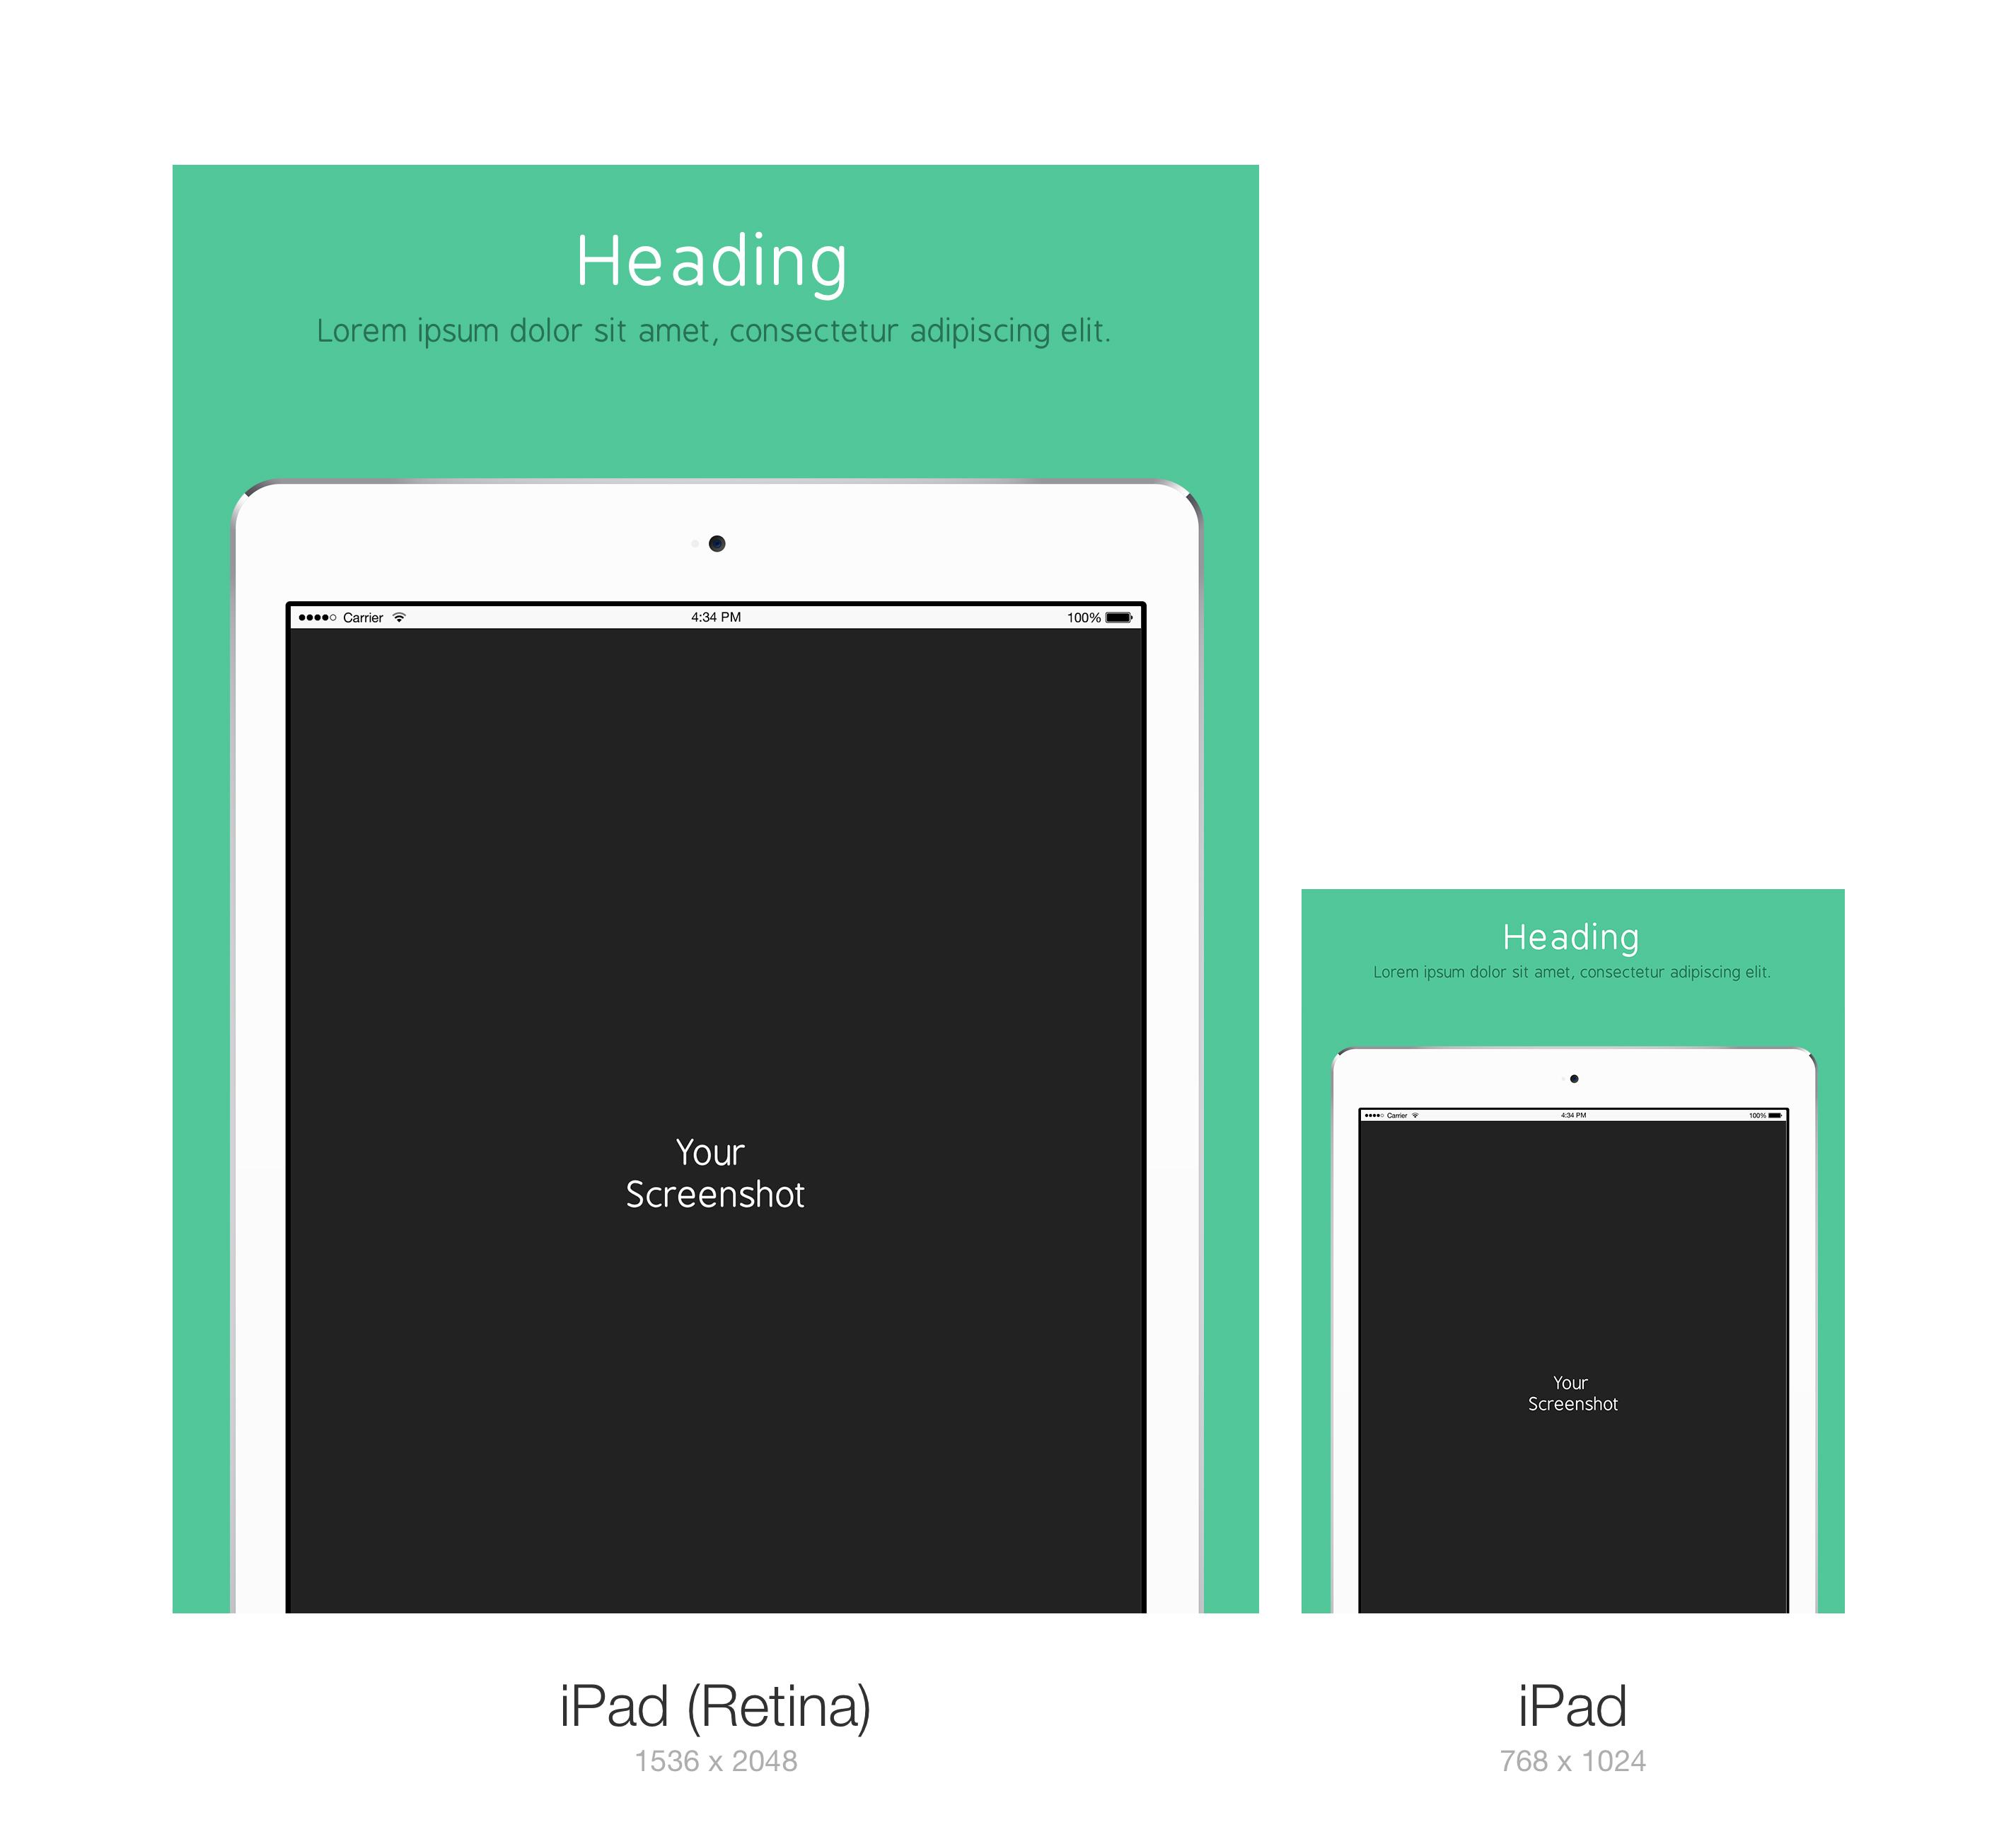 Apple Product Mockup PSD Design ipad